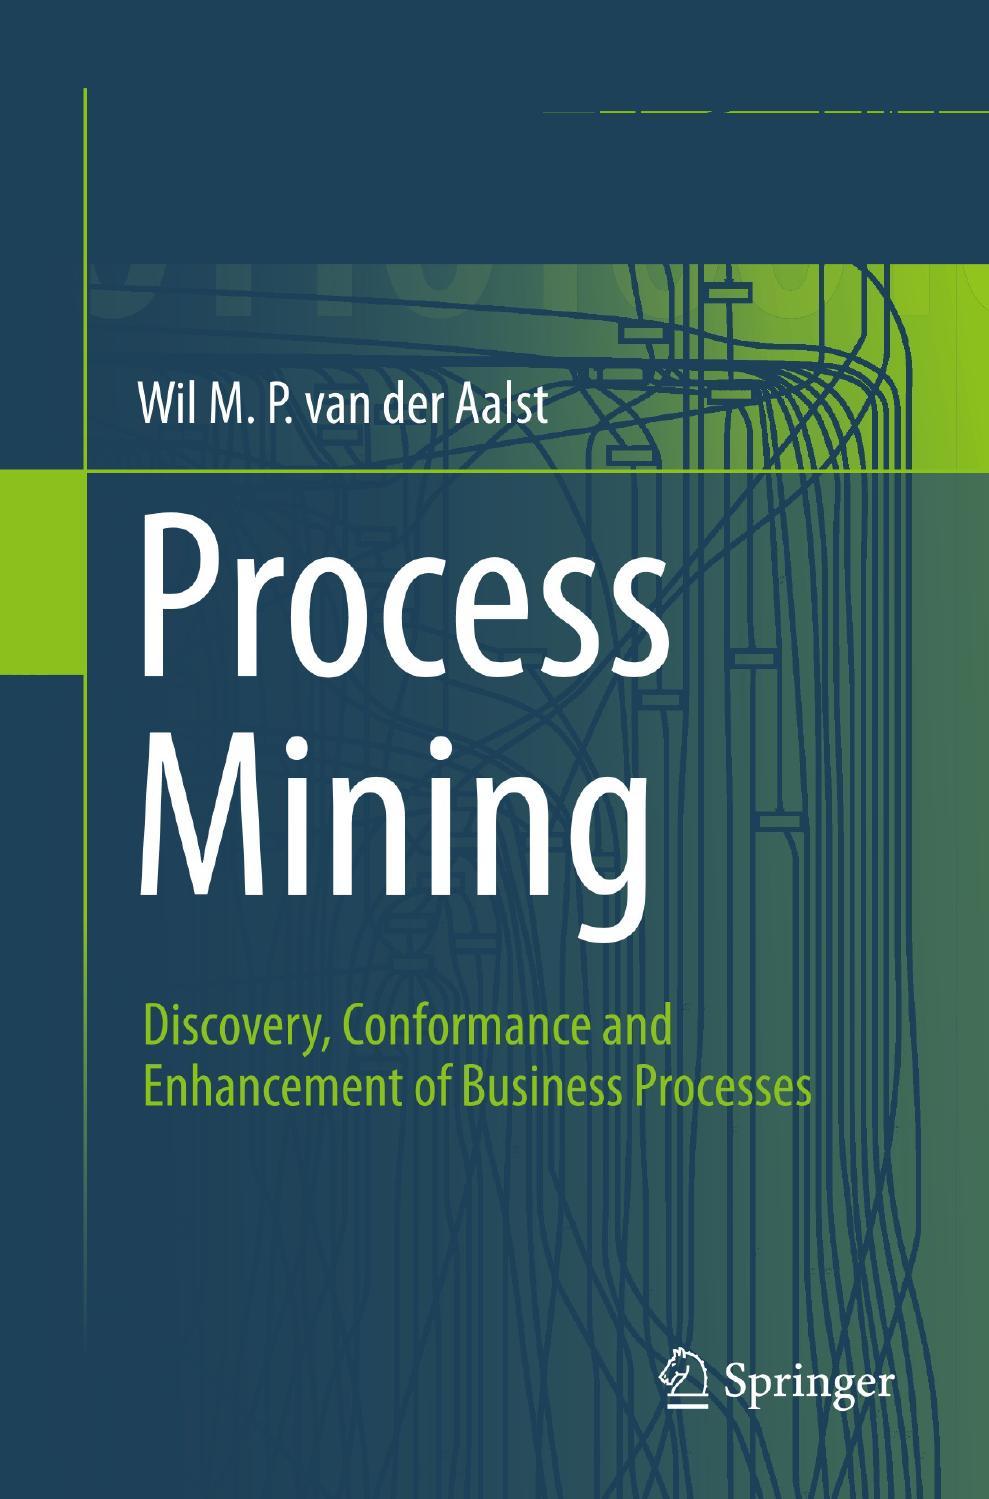 Process mining book by Ana Rocío Cárdenas Maita - issuu